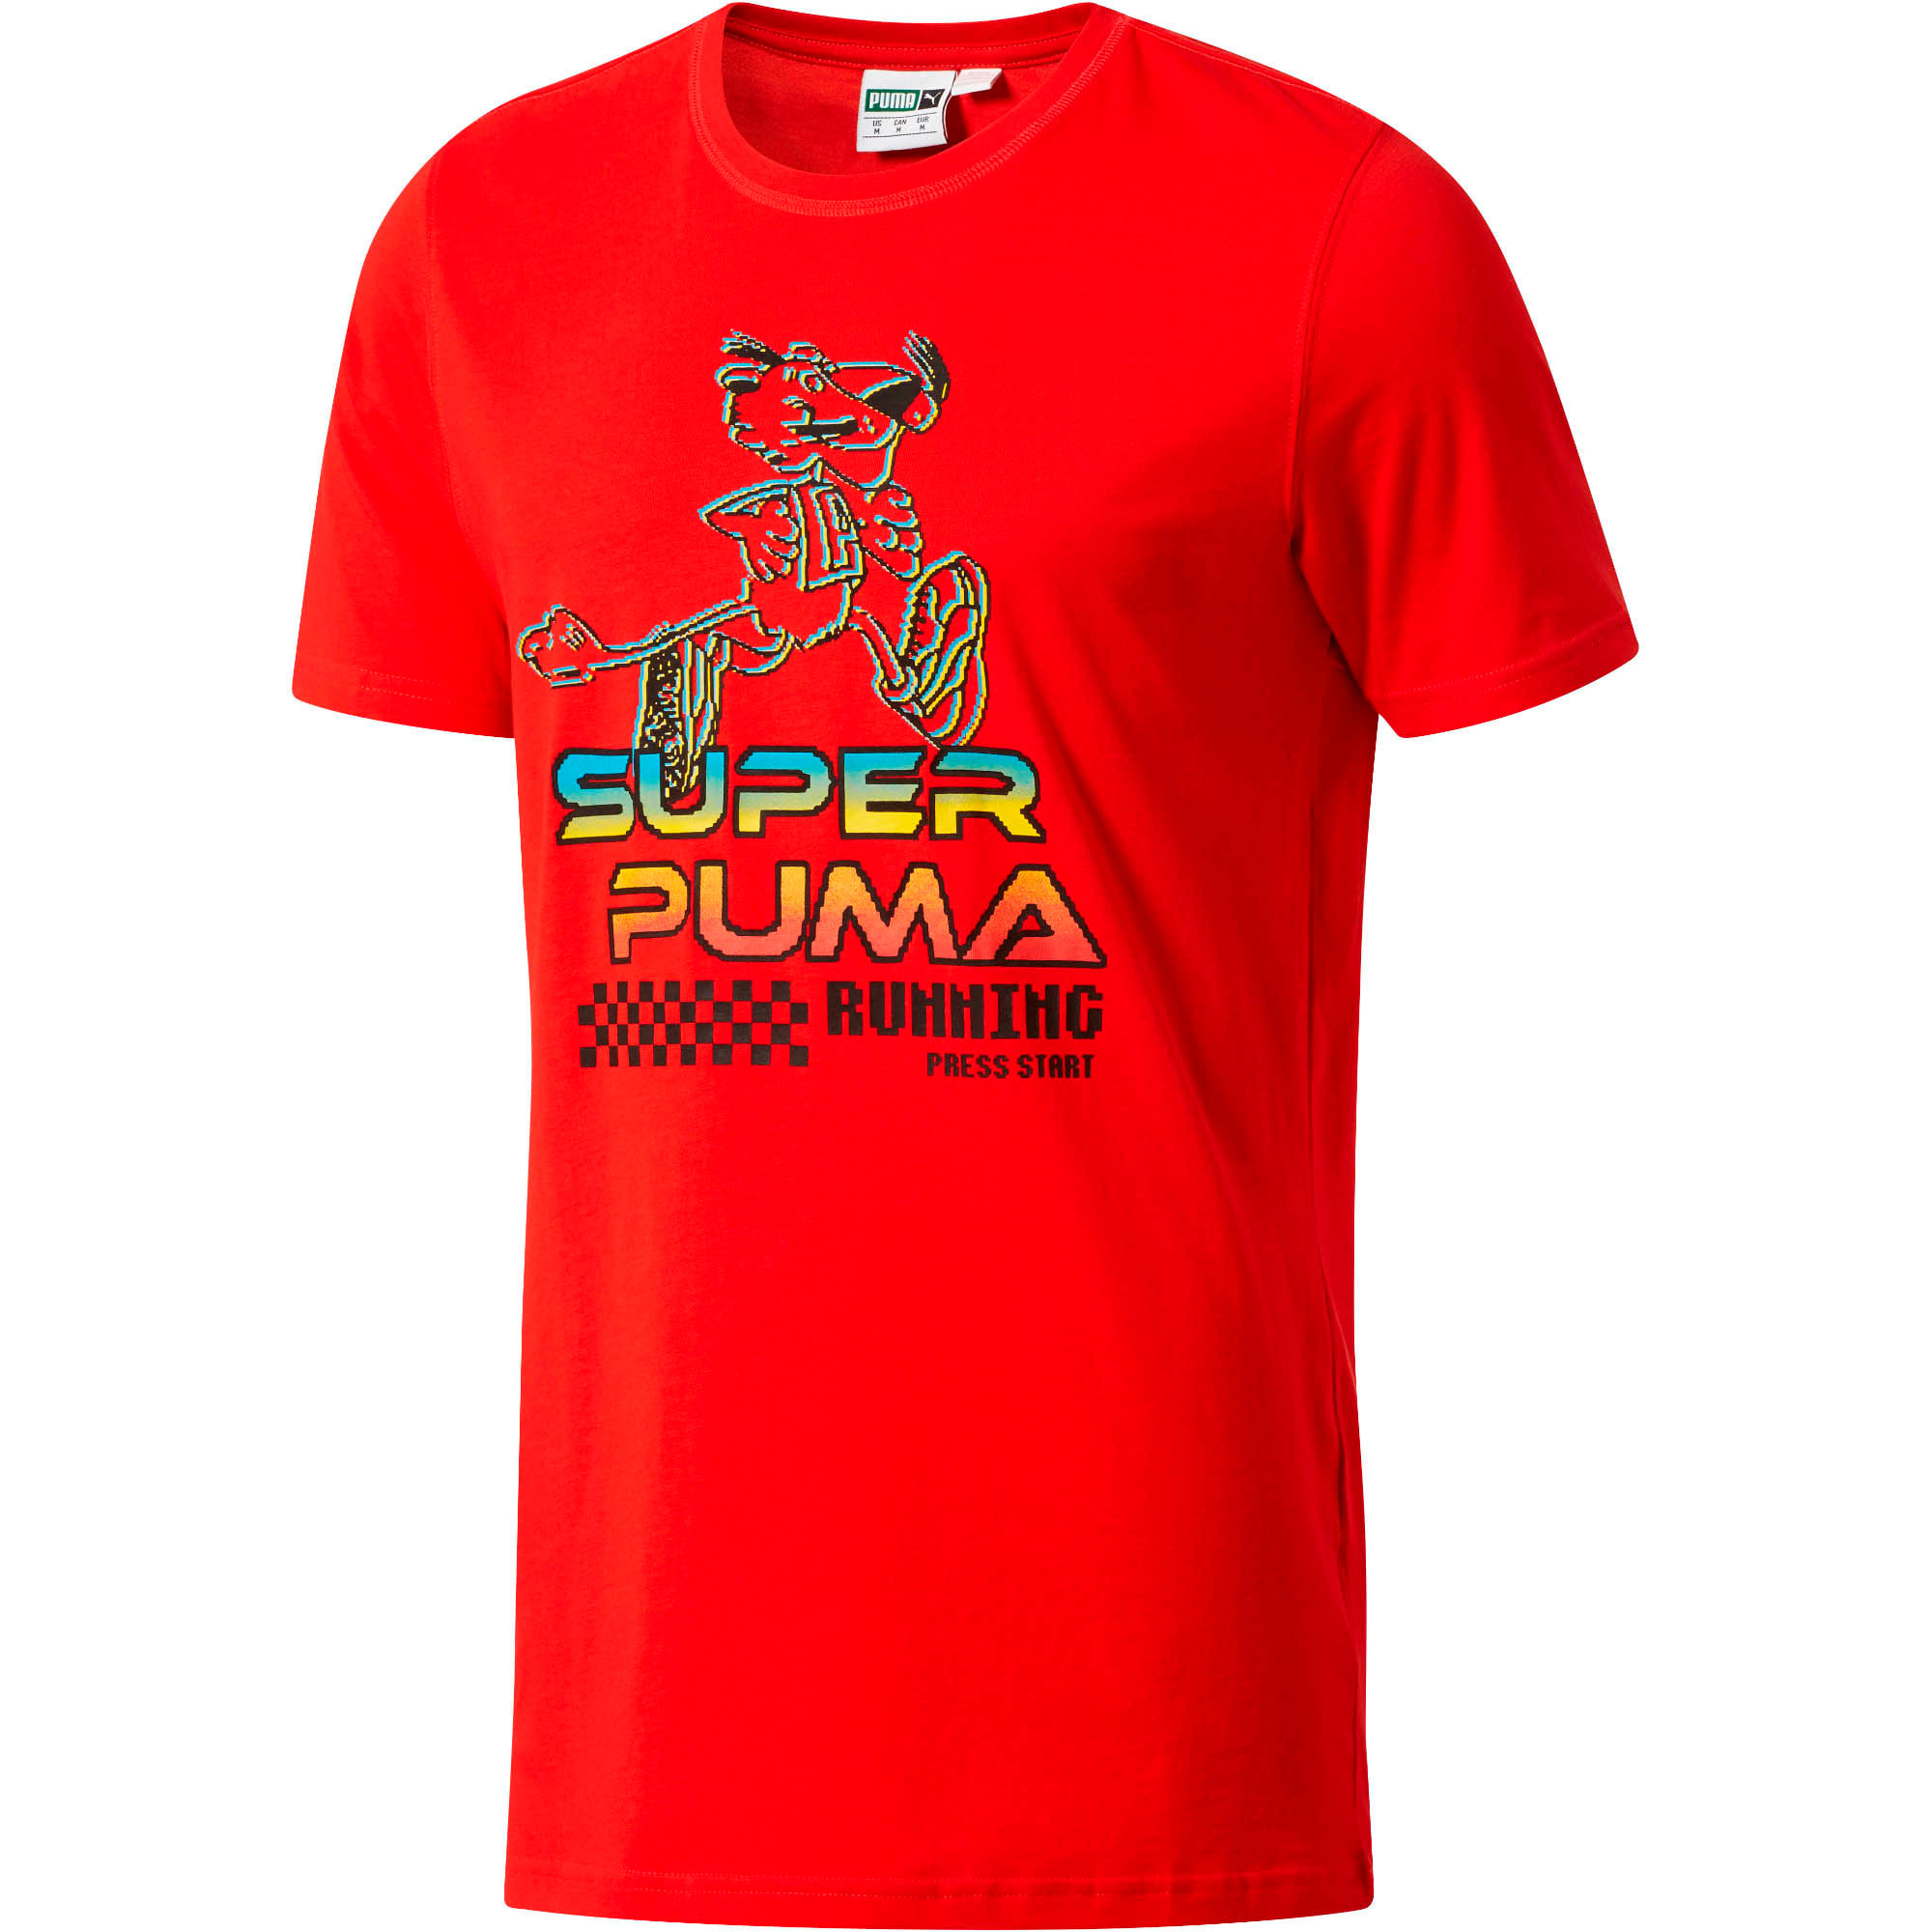 Thumbnail 1 of SUPER PUMA Play Men's Tee, High Risk Red, medium